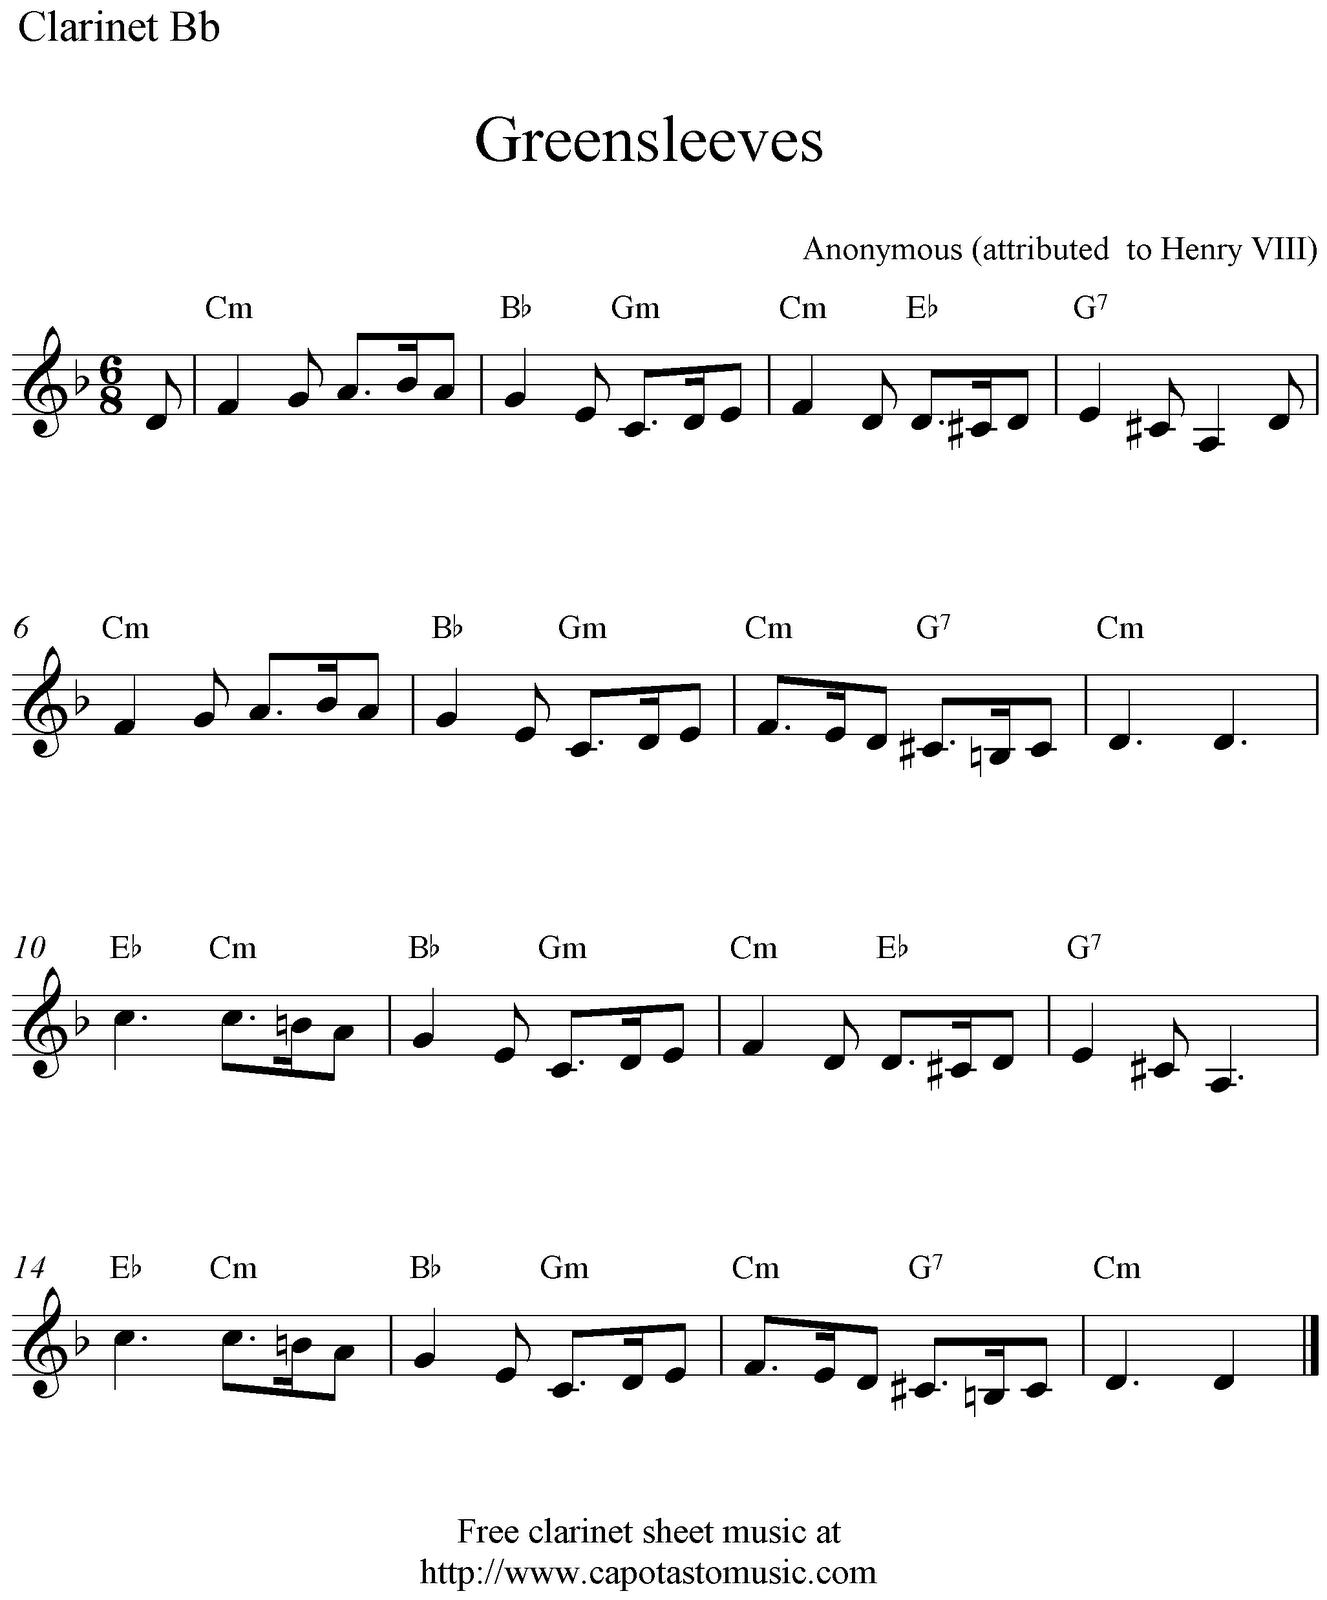 Greensleeves, Free Clarinet Sheet Music Notes